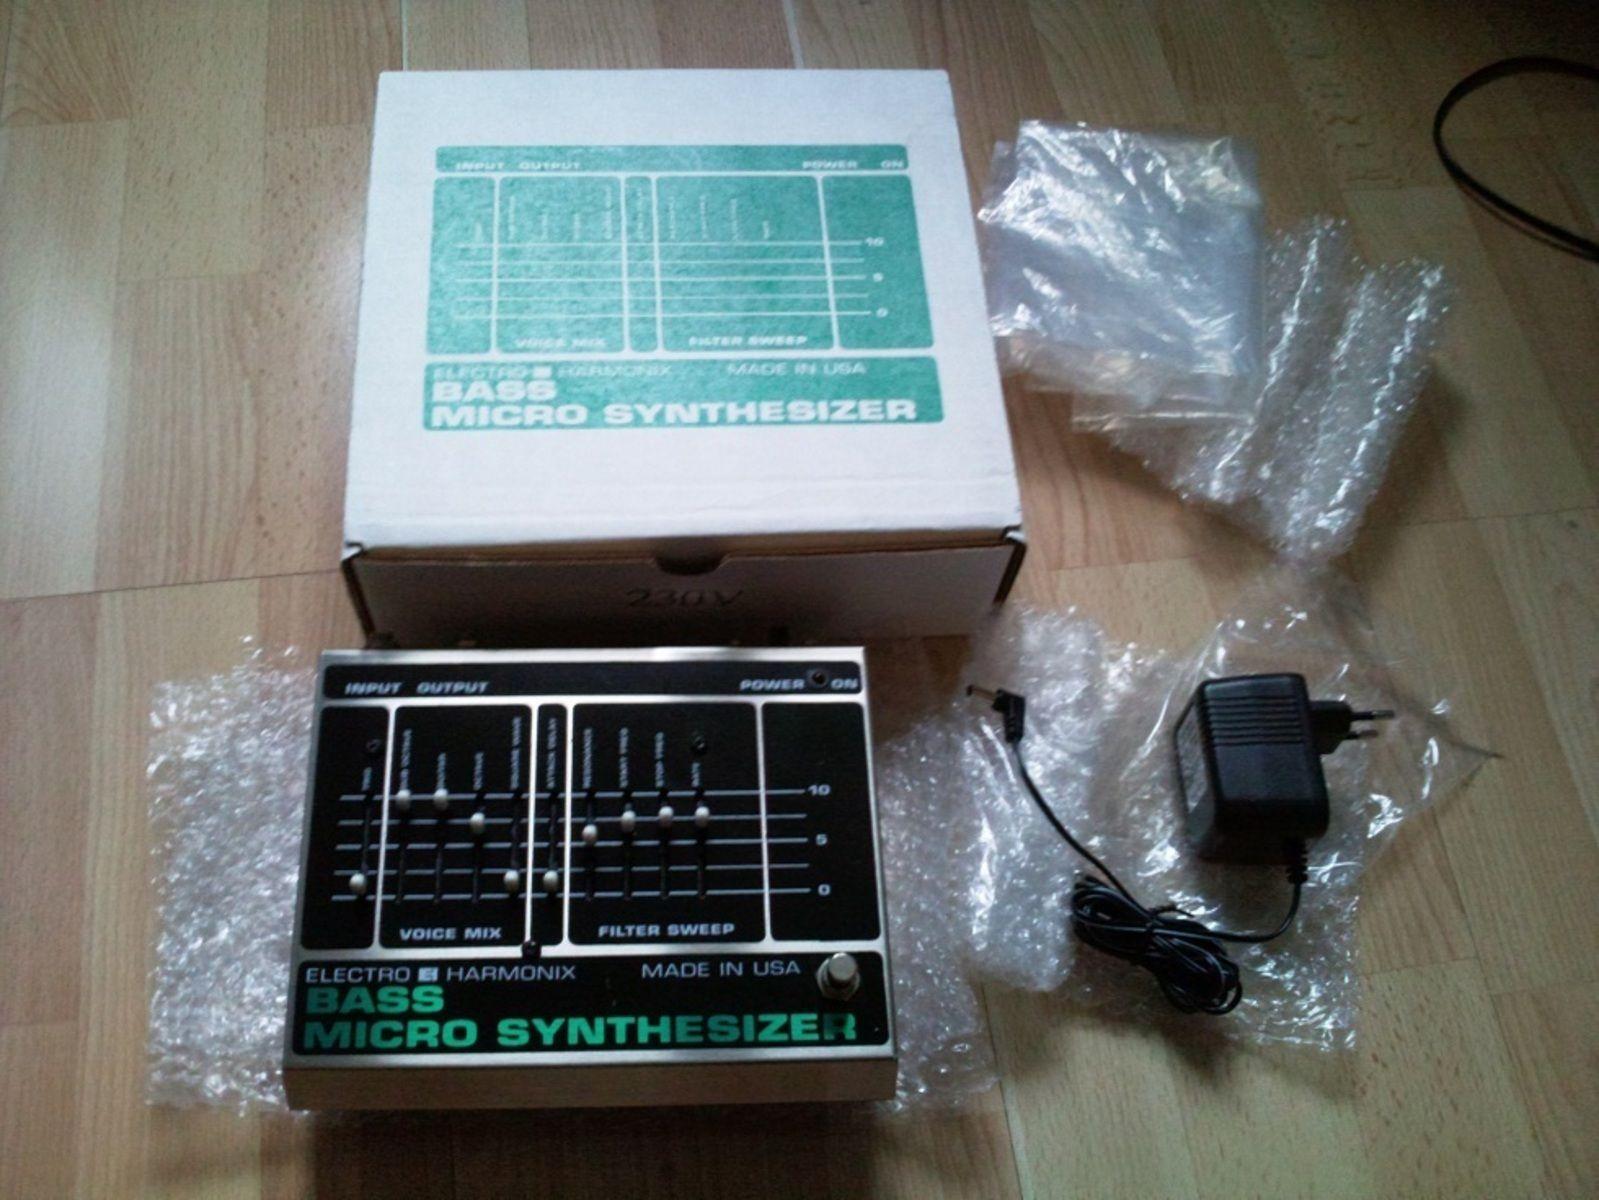 electro harmonix bass micro synthesizer original image 19170 audiofanzine. Black Bedroom Furniture Sets. Home Design Ideas